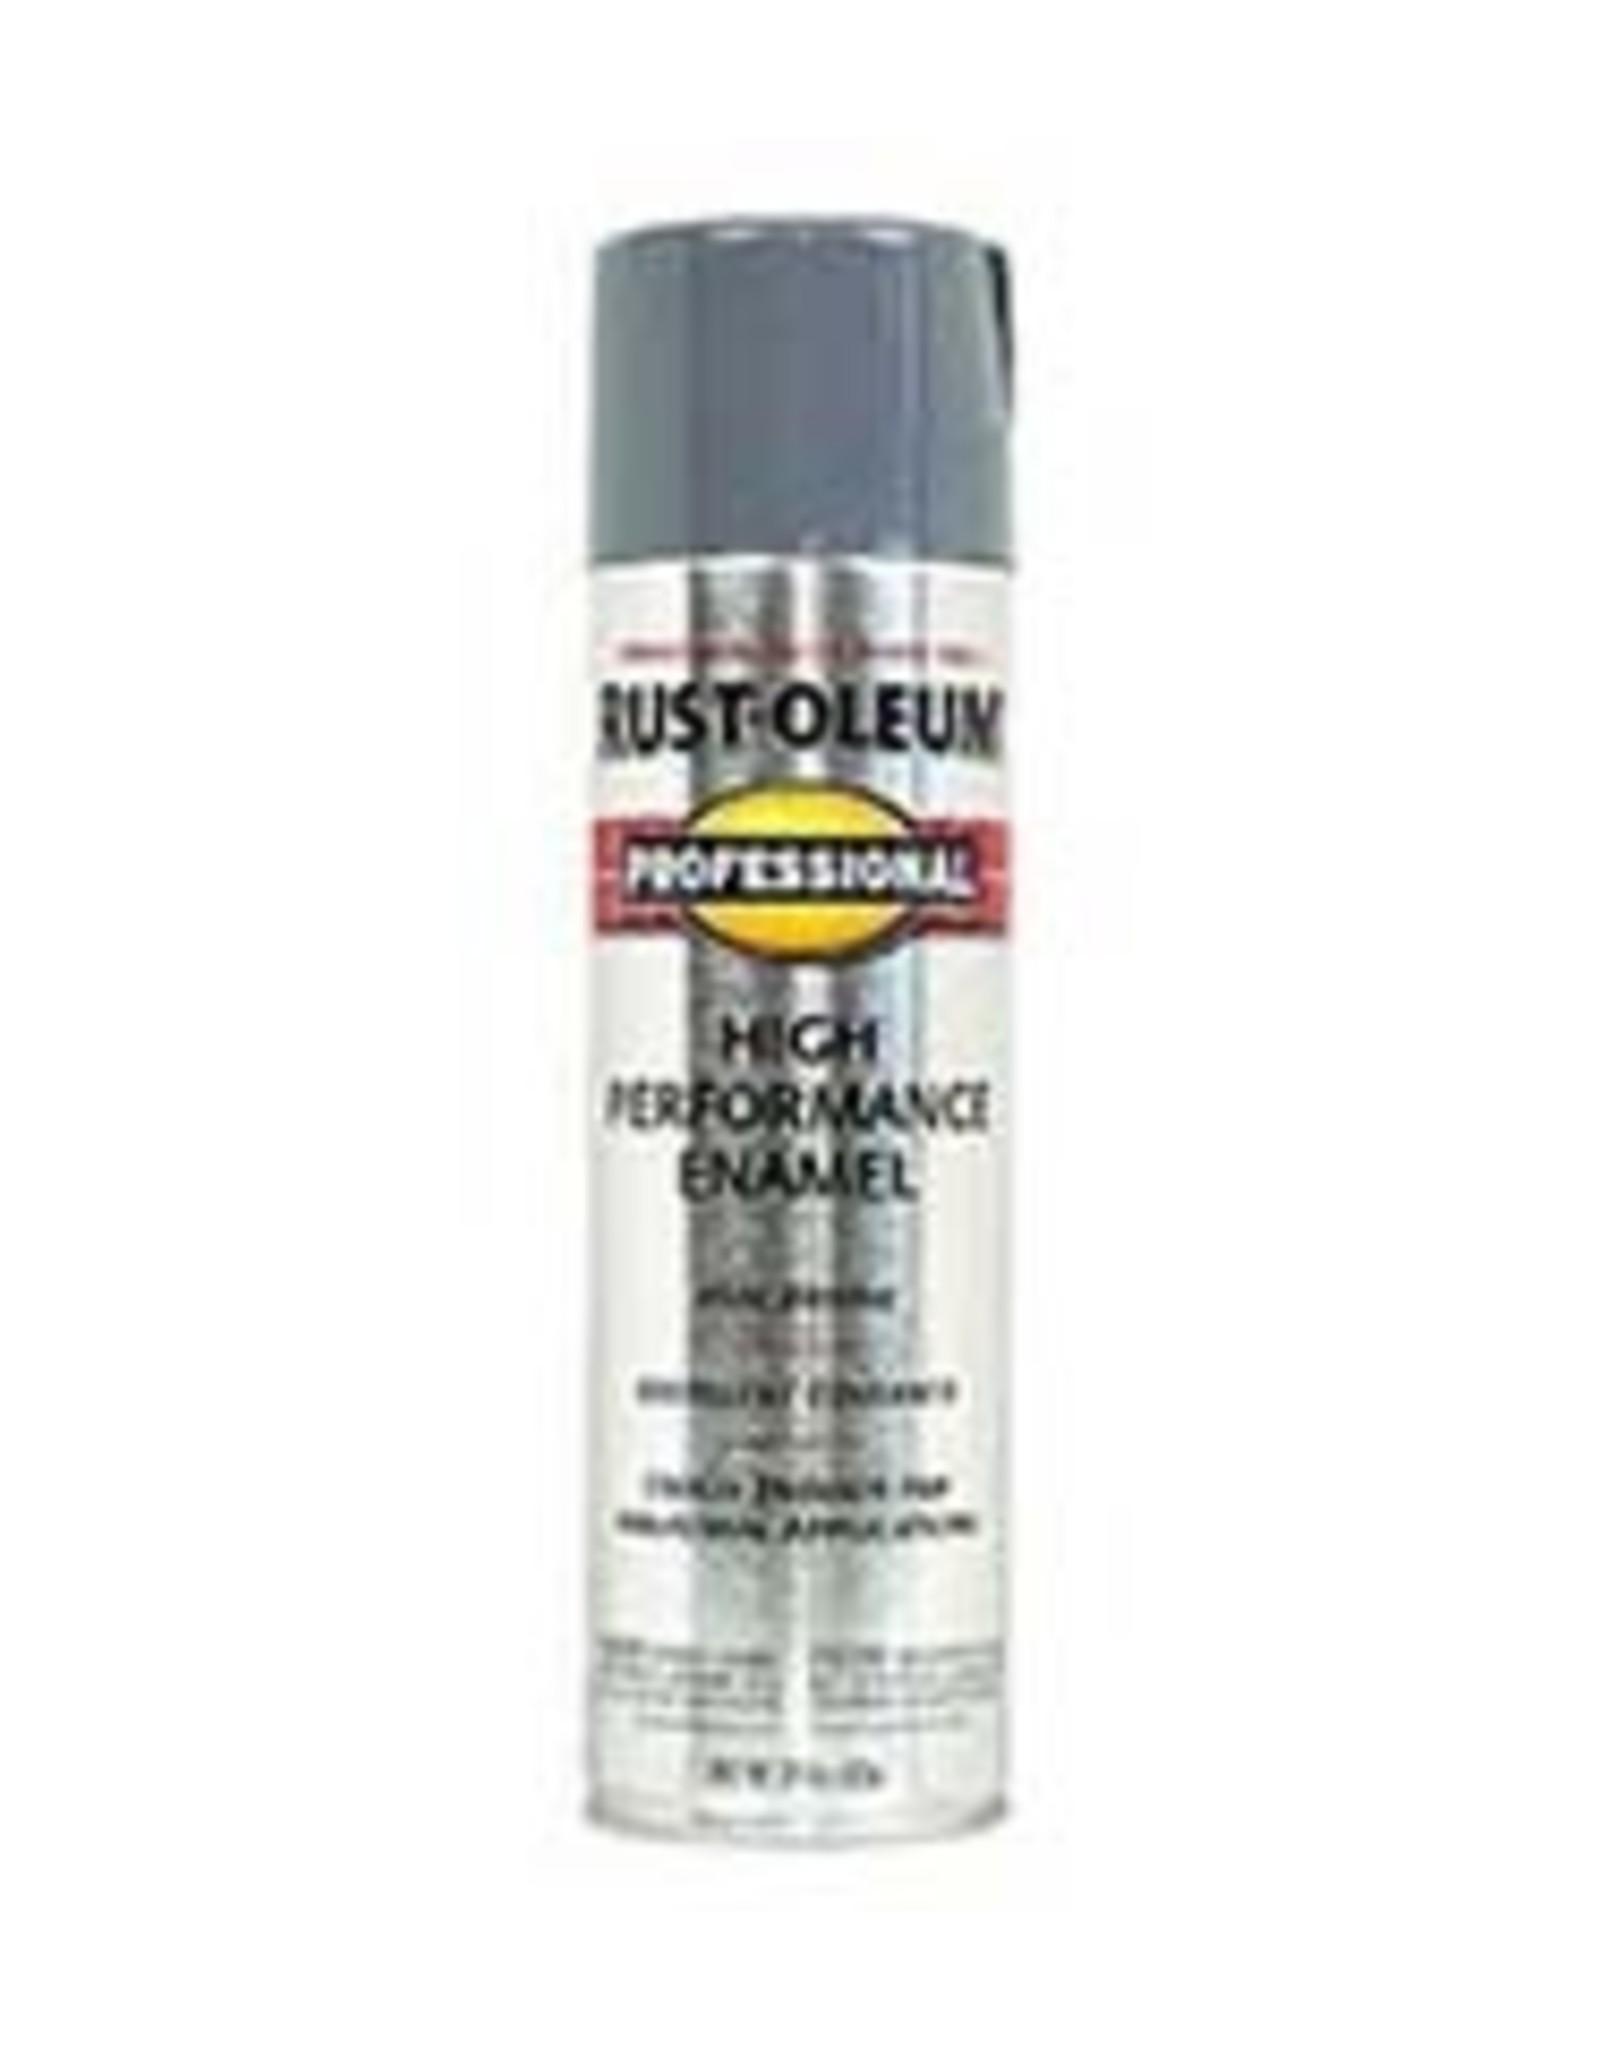 Rust-Oleum Rust-Oleum 7587 15 oz Professional Spray Paint Dark Machine Gray